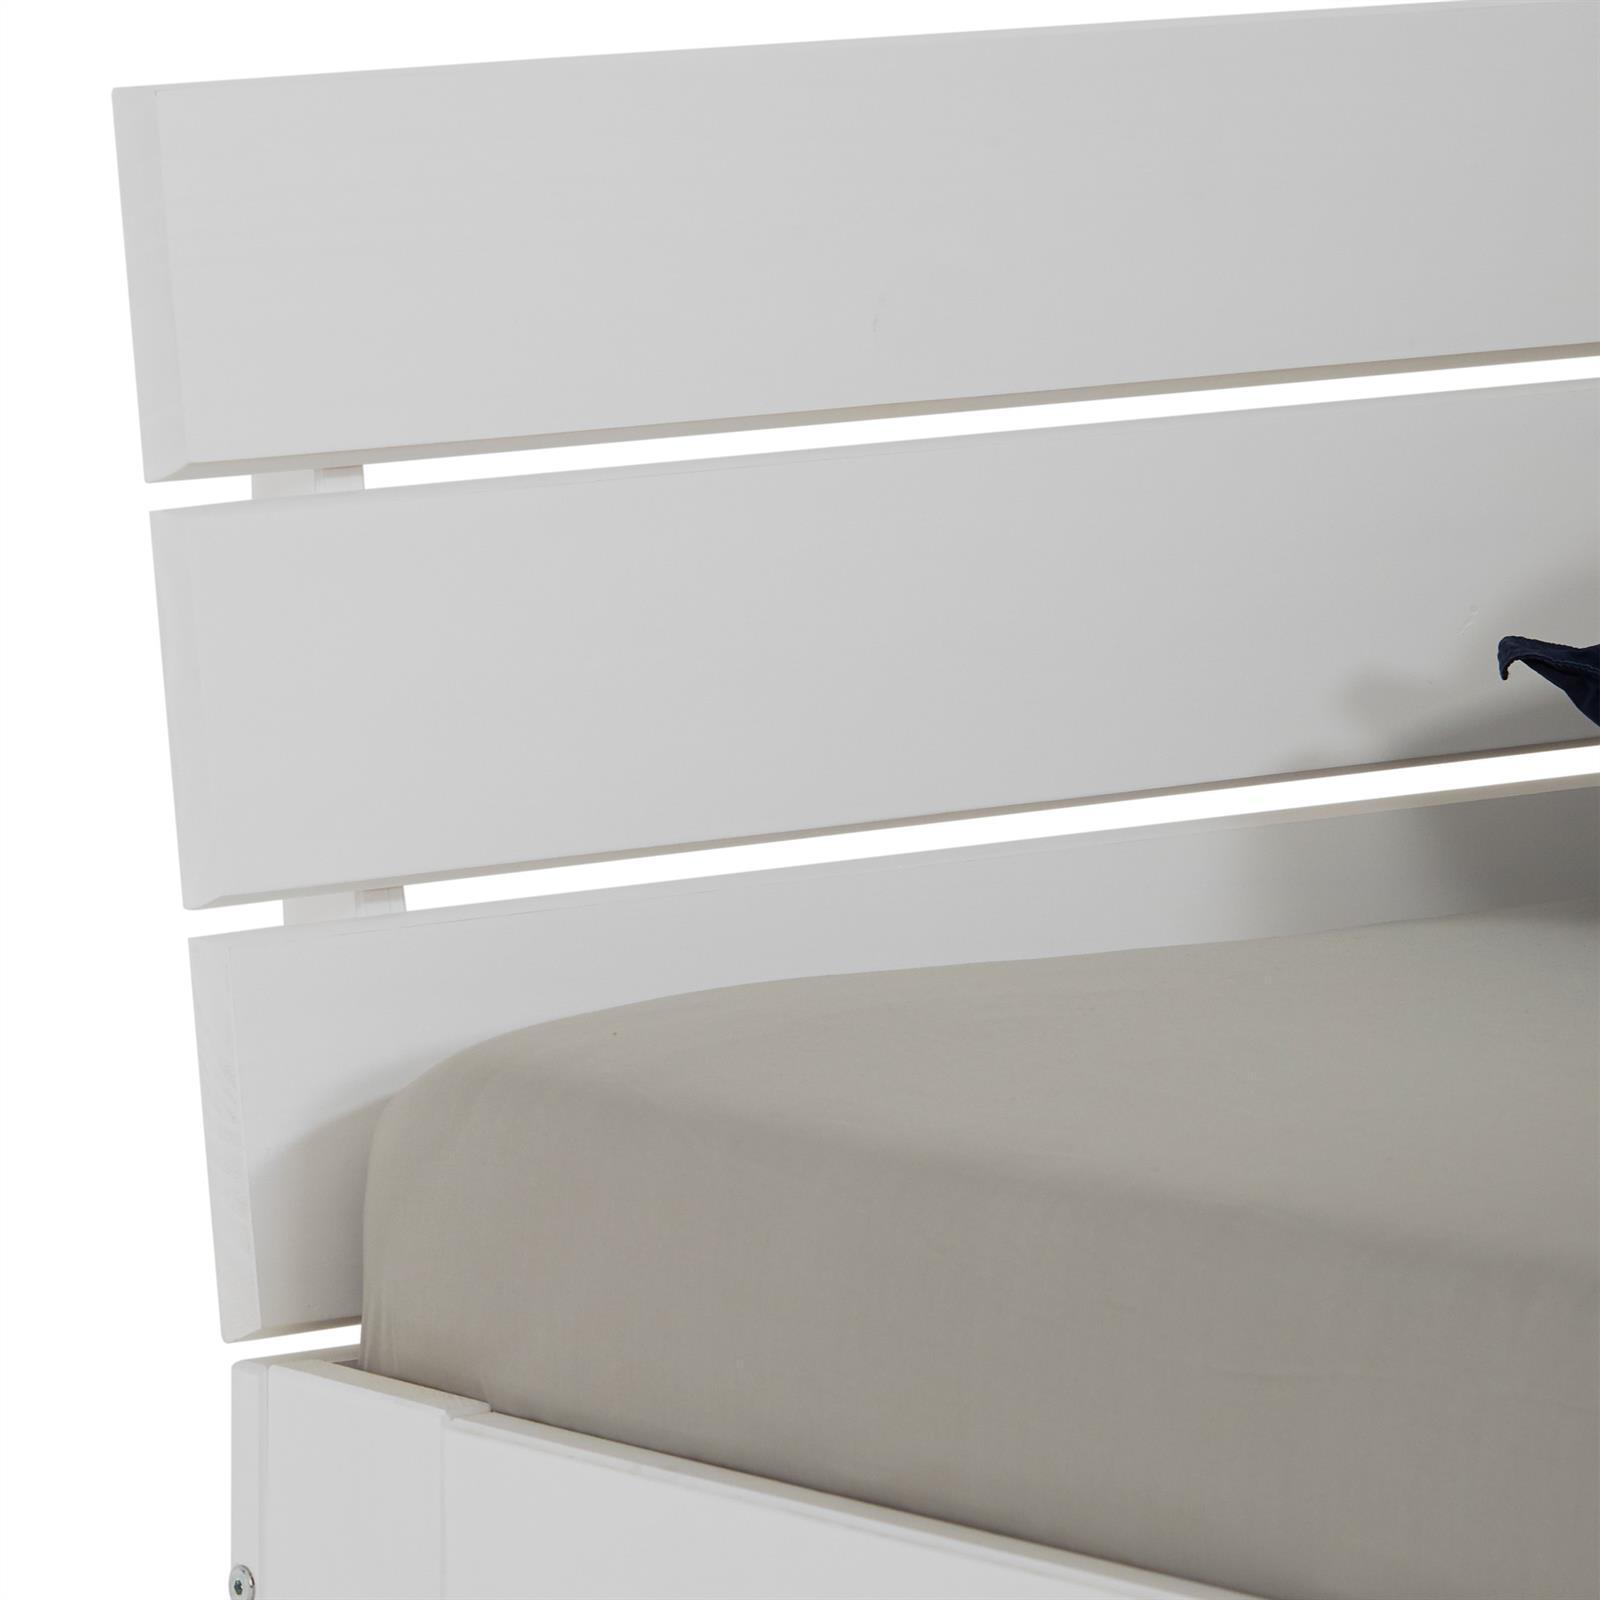 doppelbett thomas 140x200 cm wei mobilia24. Black Bedroom Furniture Sets. Home Design Ideas